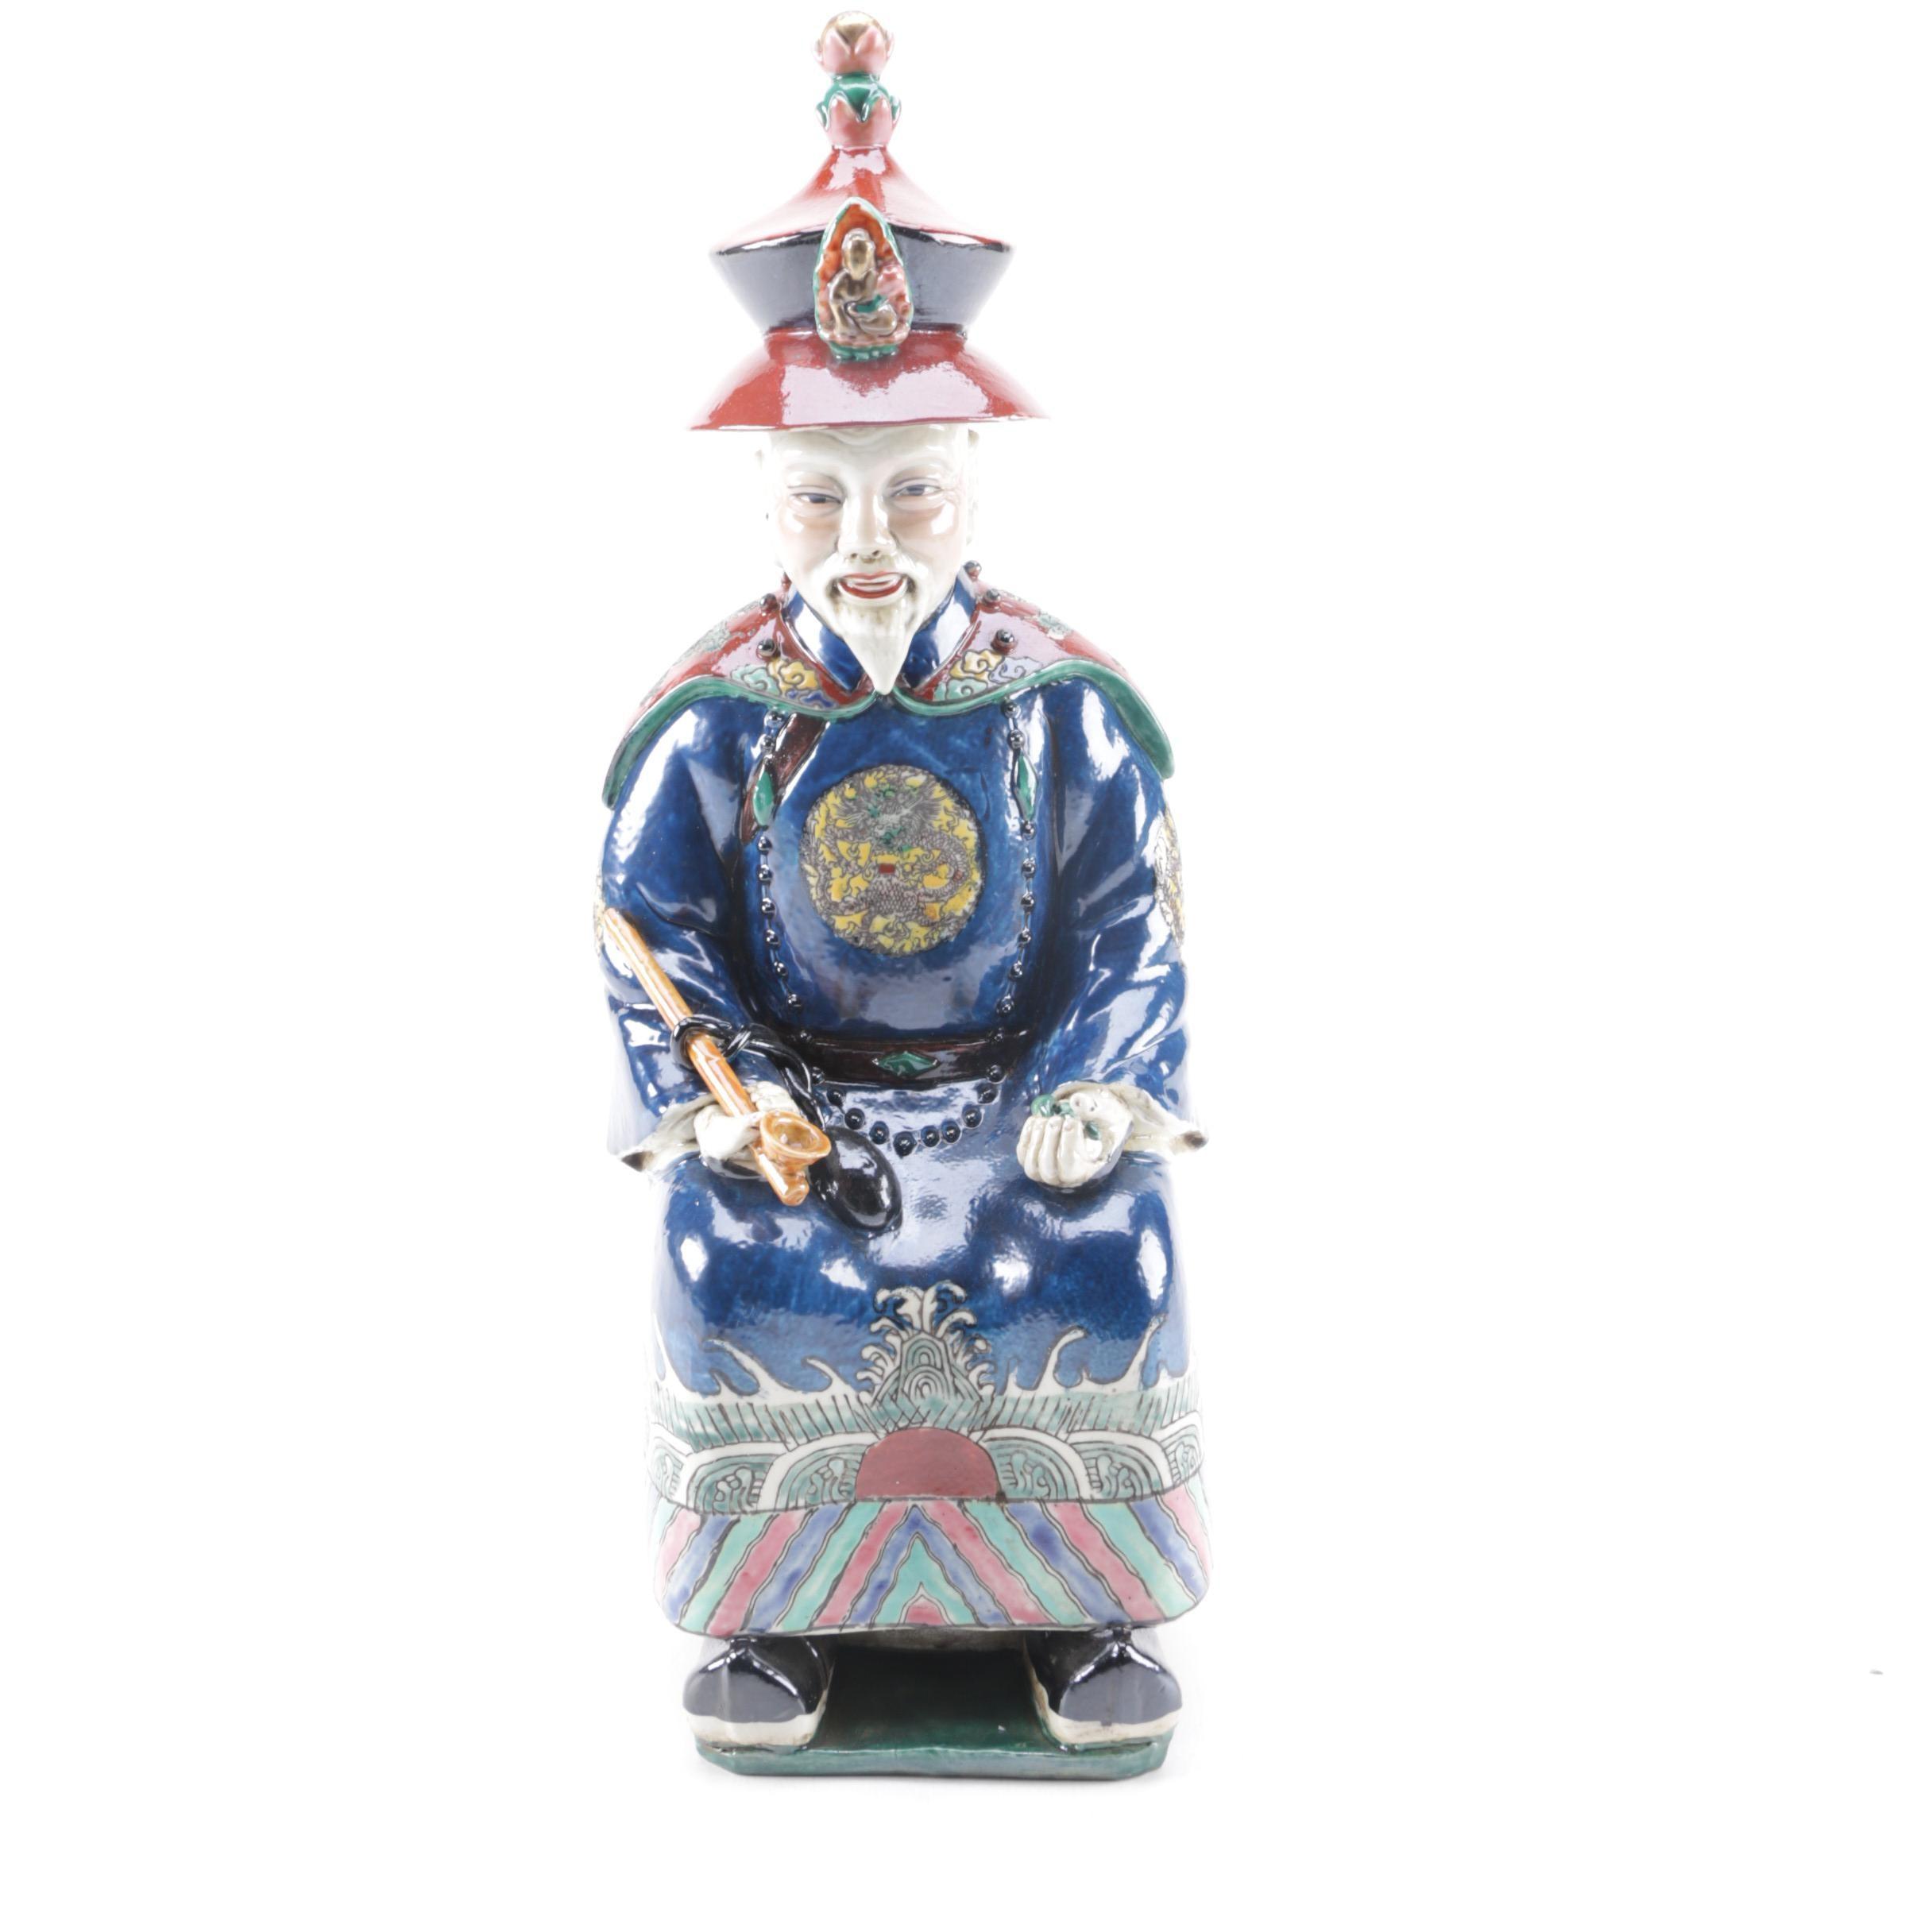 Chinese Ceramic Figurine of an Older Man